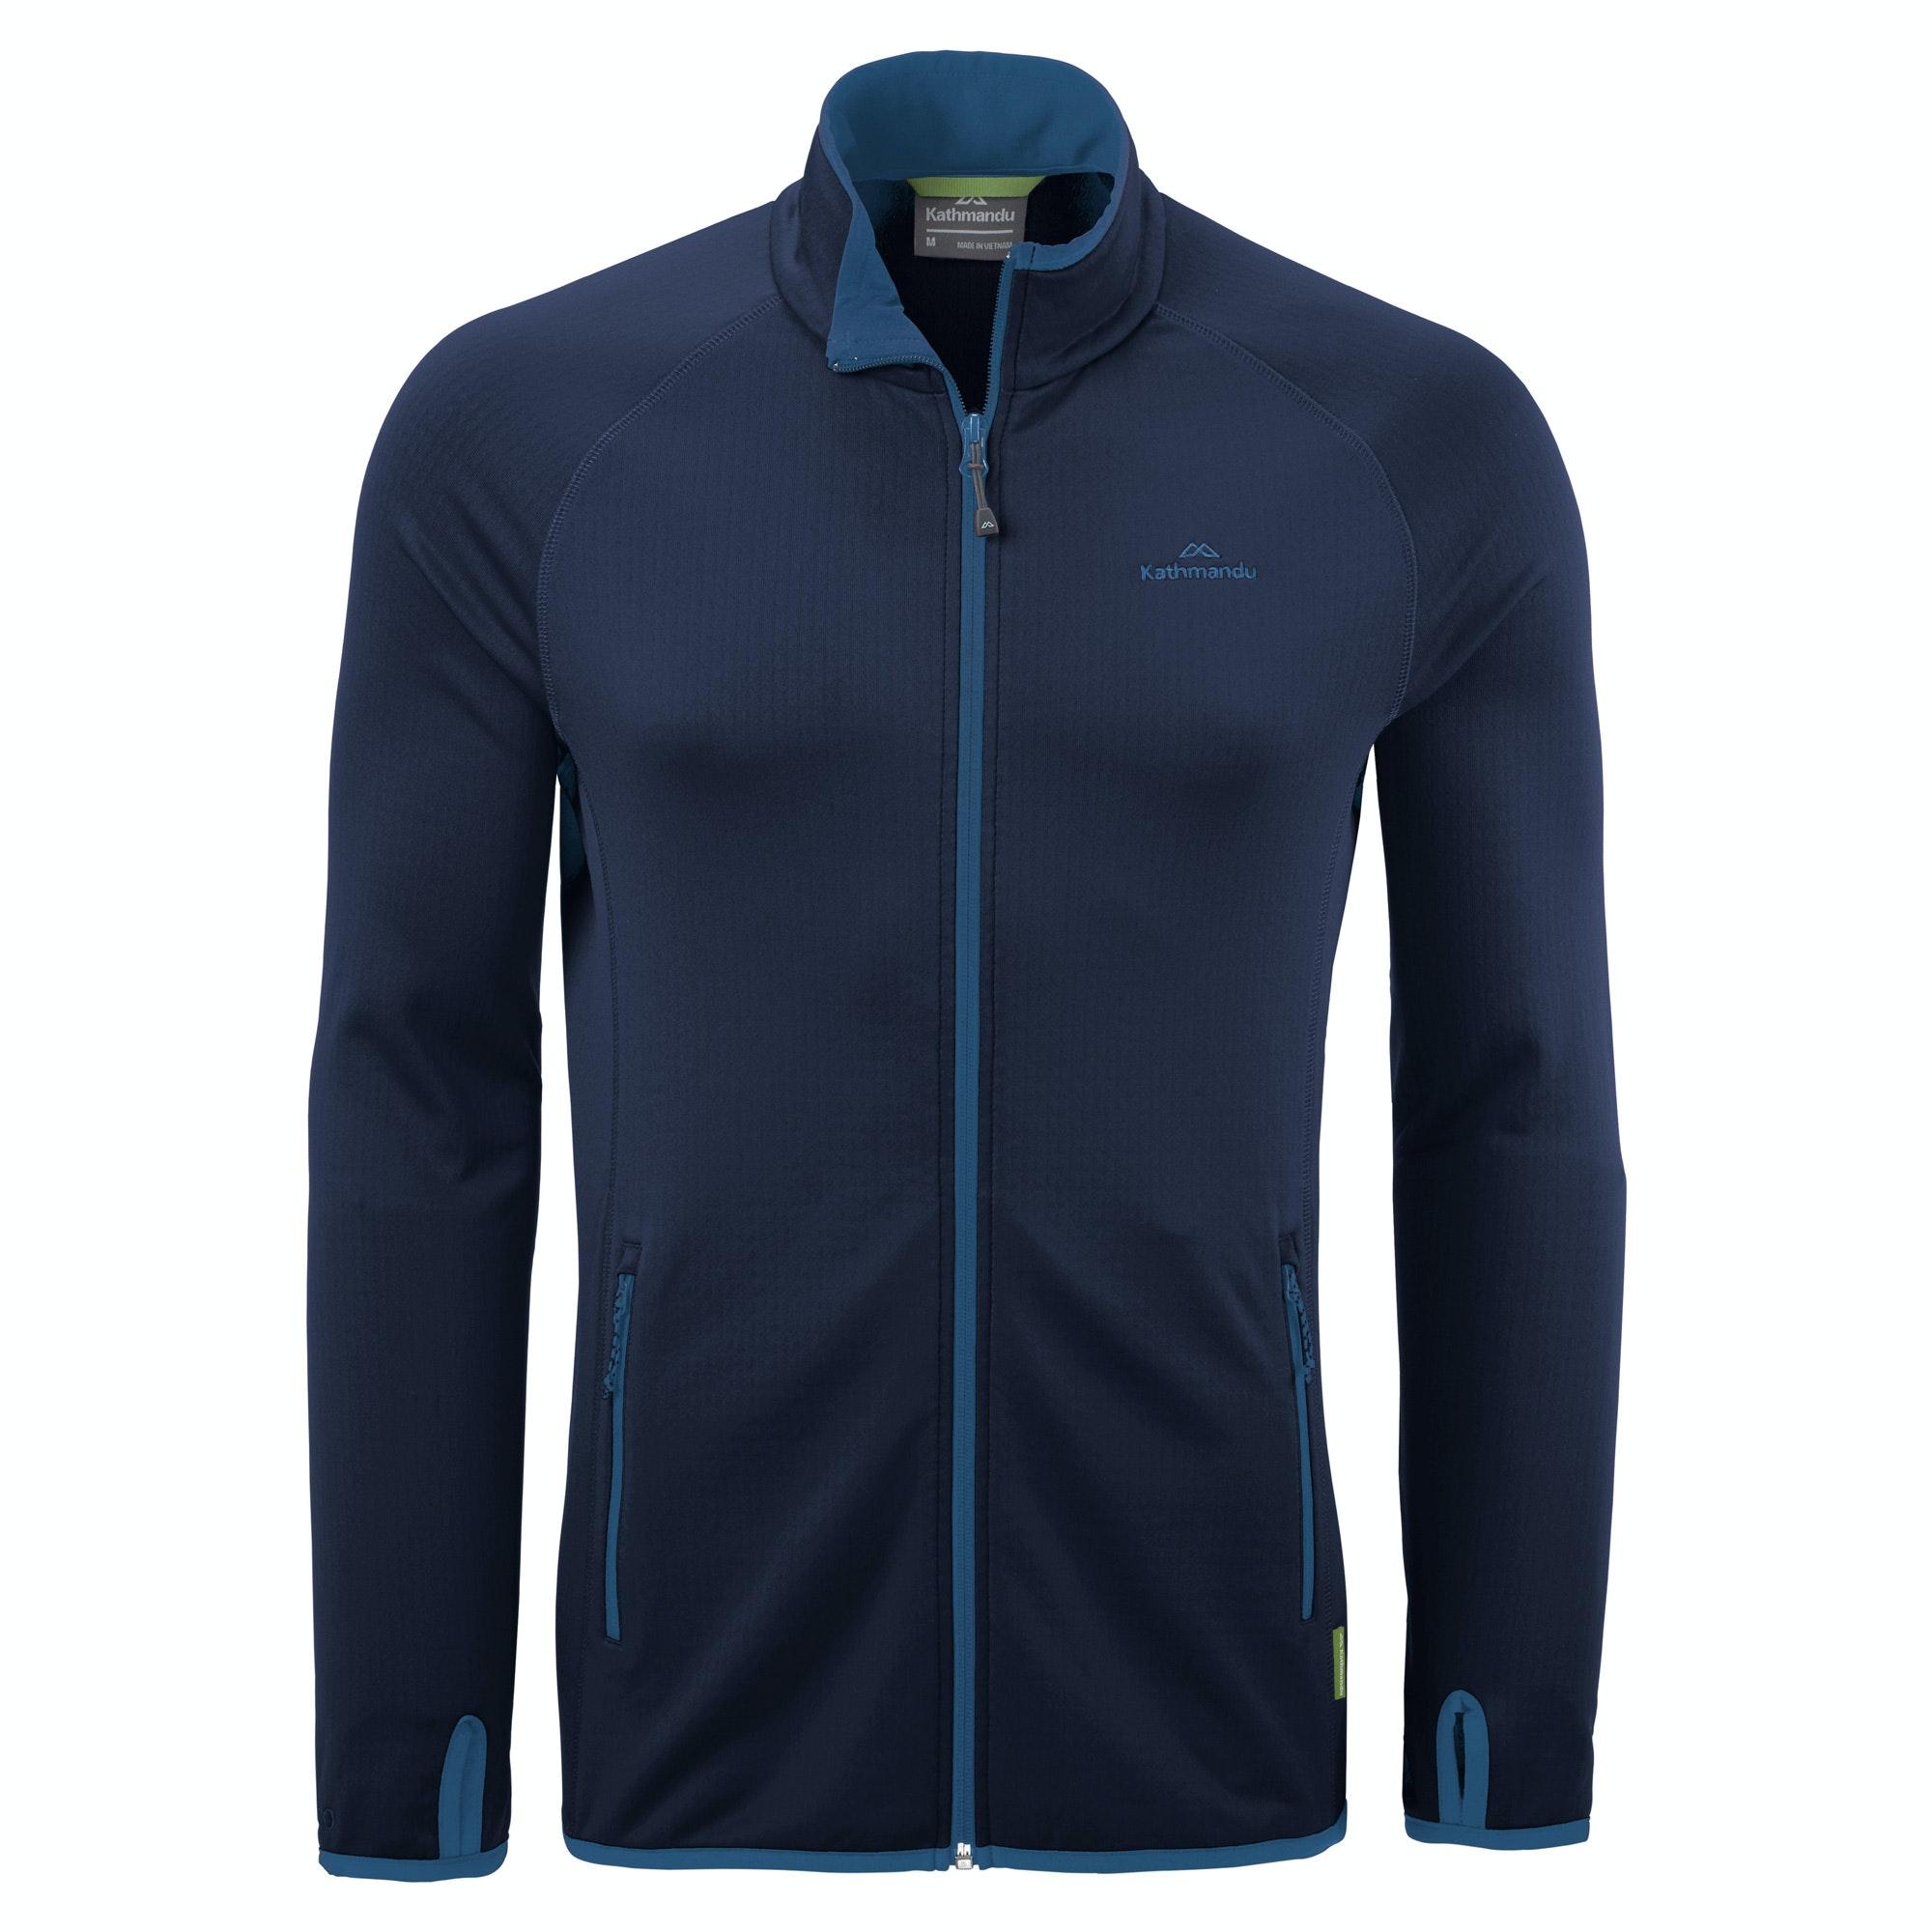 Men's Fleece Jackets - Australia